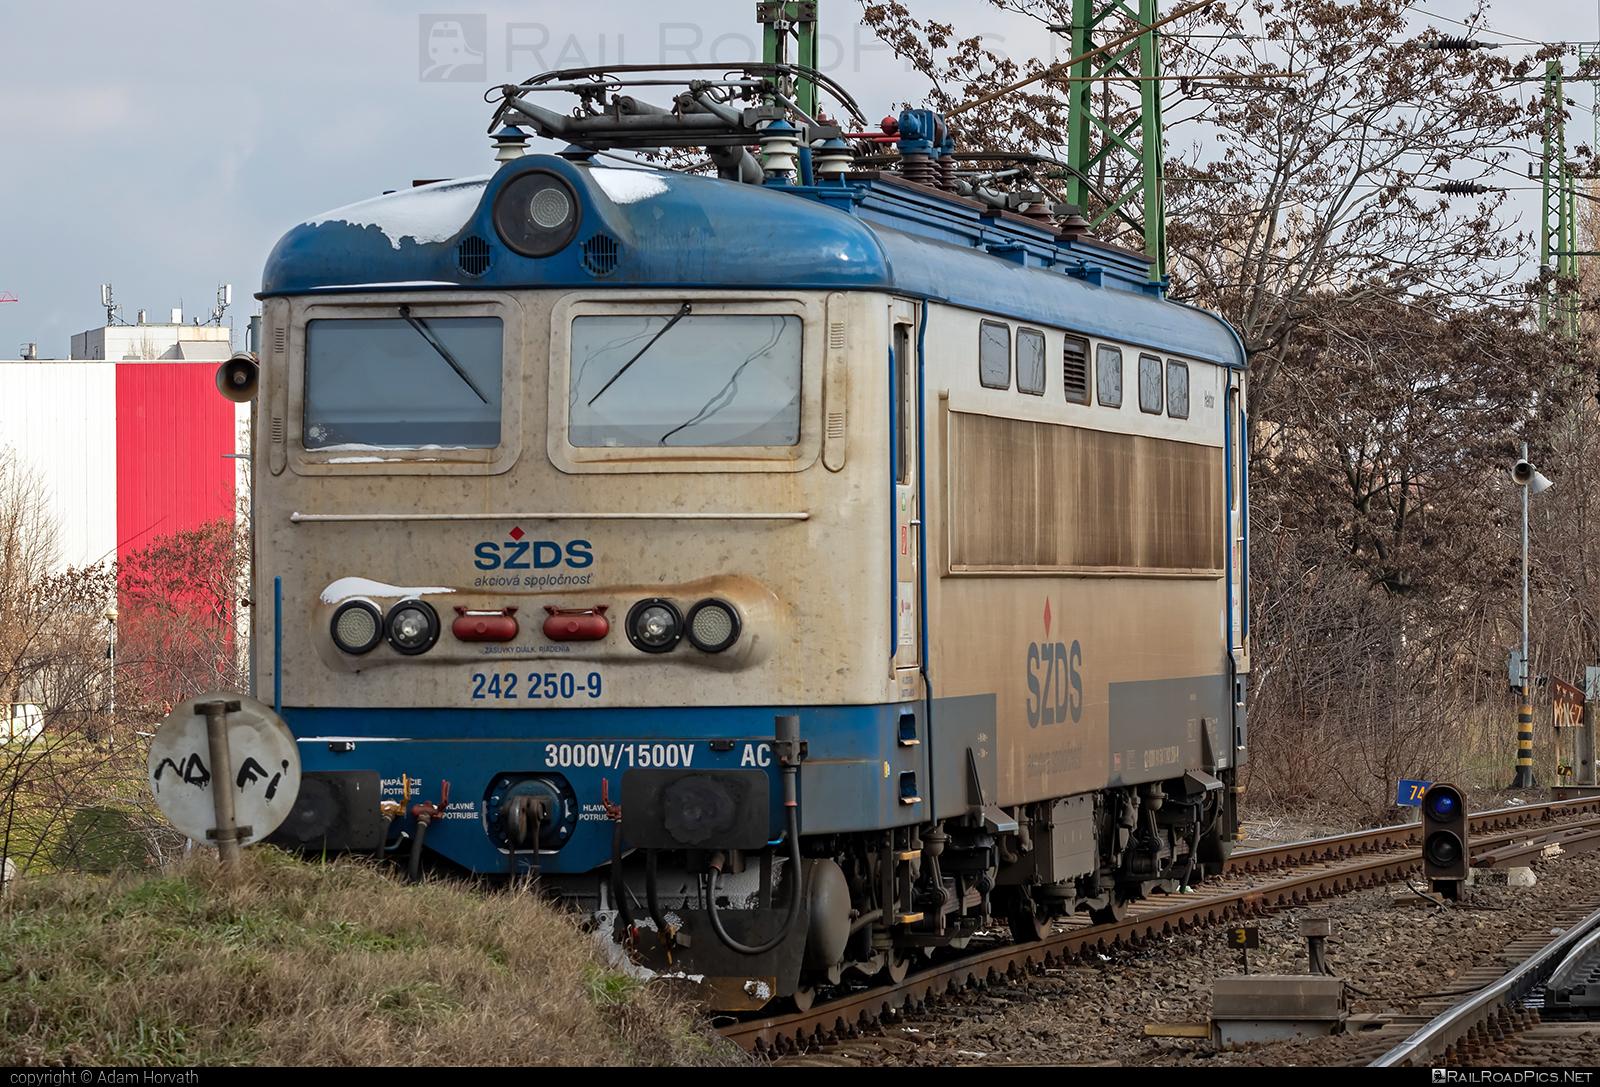 Škoda 73E - 242 250-9 operated by I. G. Rail, s. r. o. #igrail #locomotive242 #plechac #skoda #skoda73e #szds